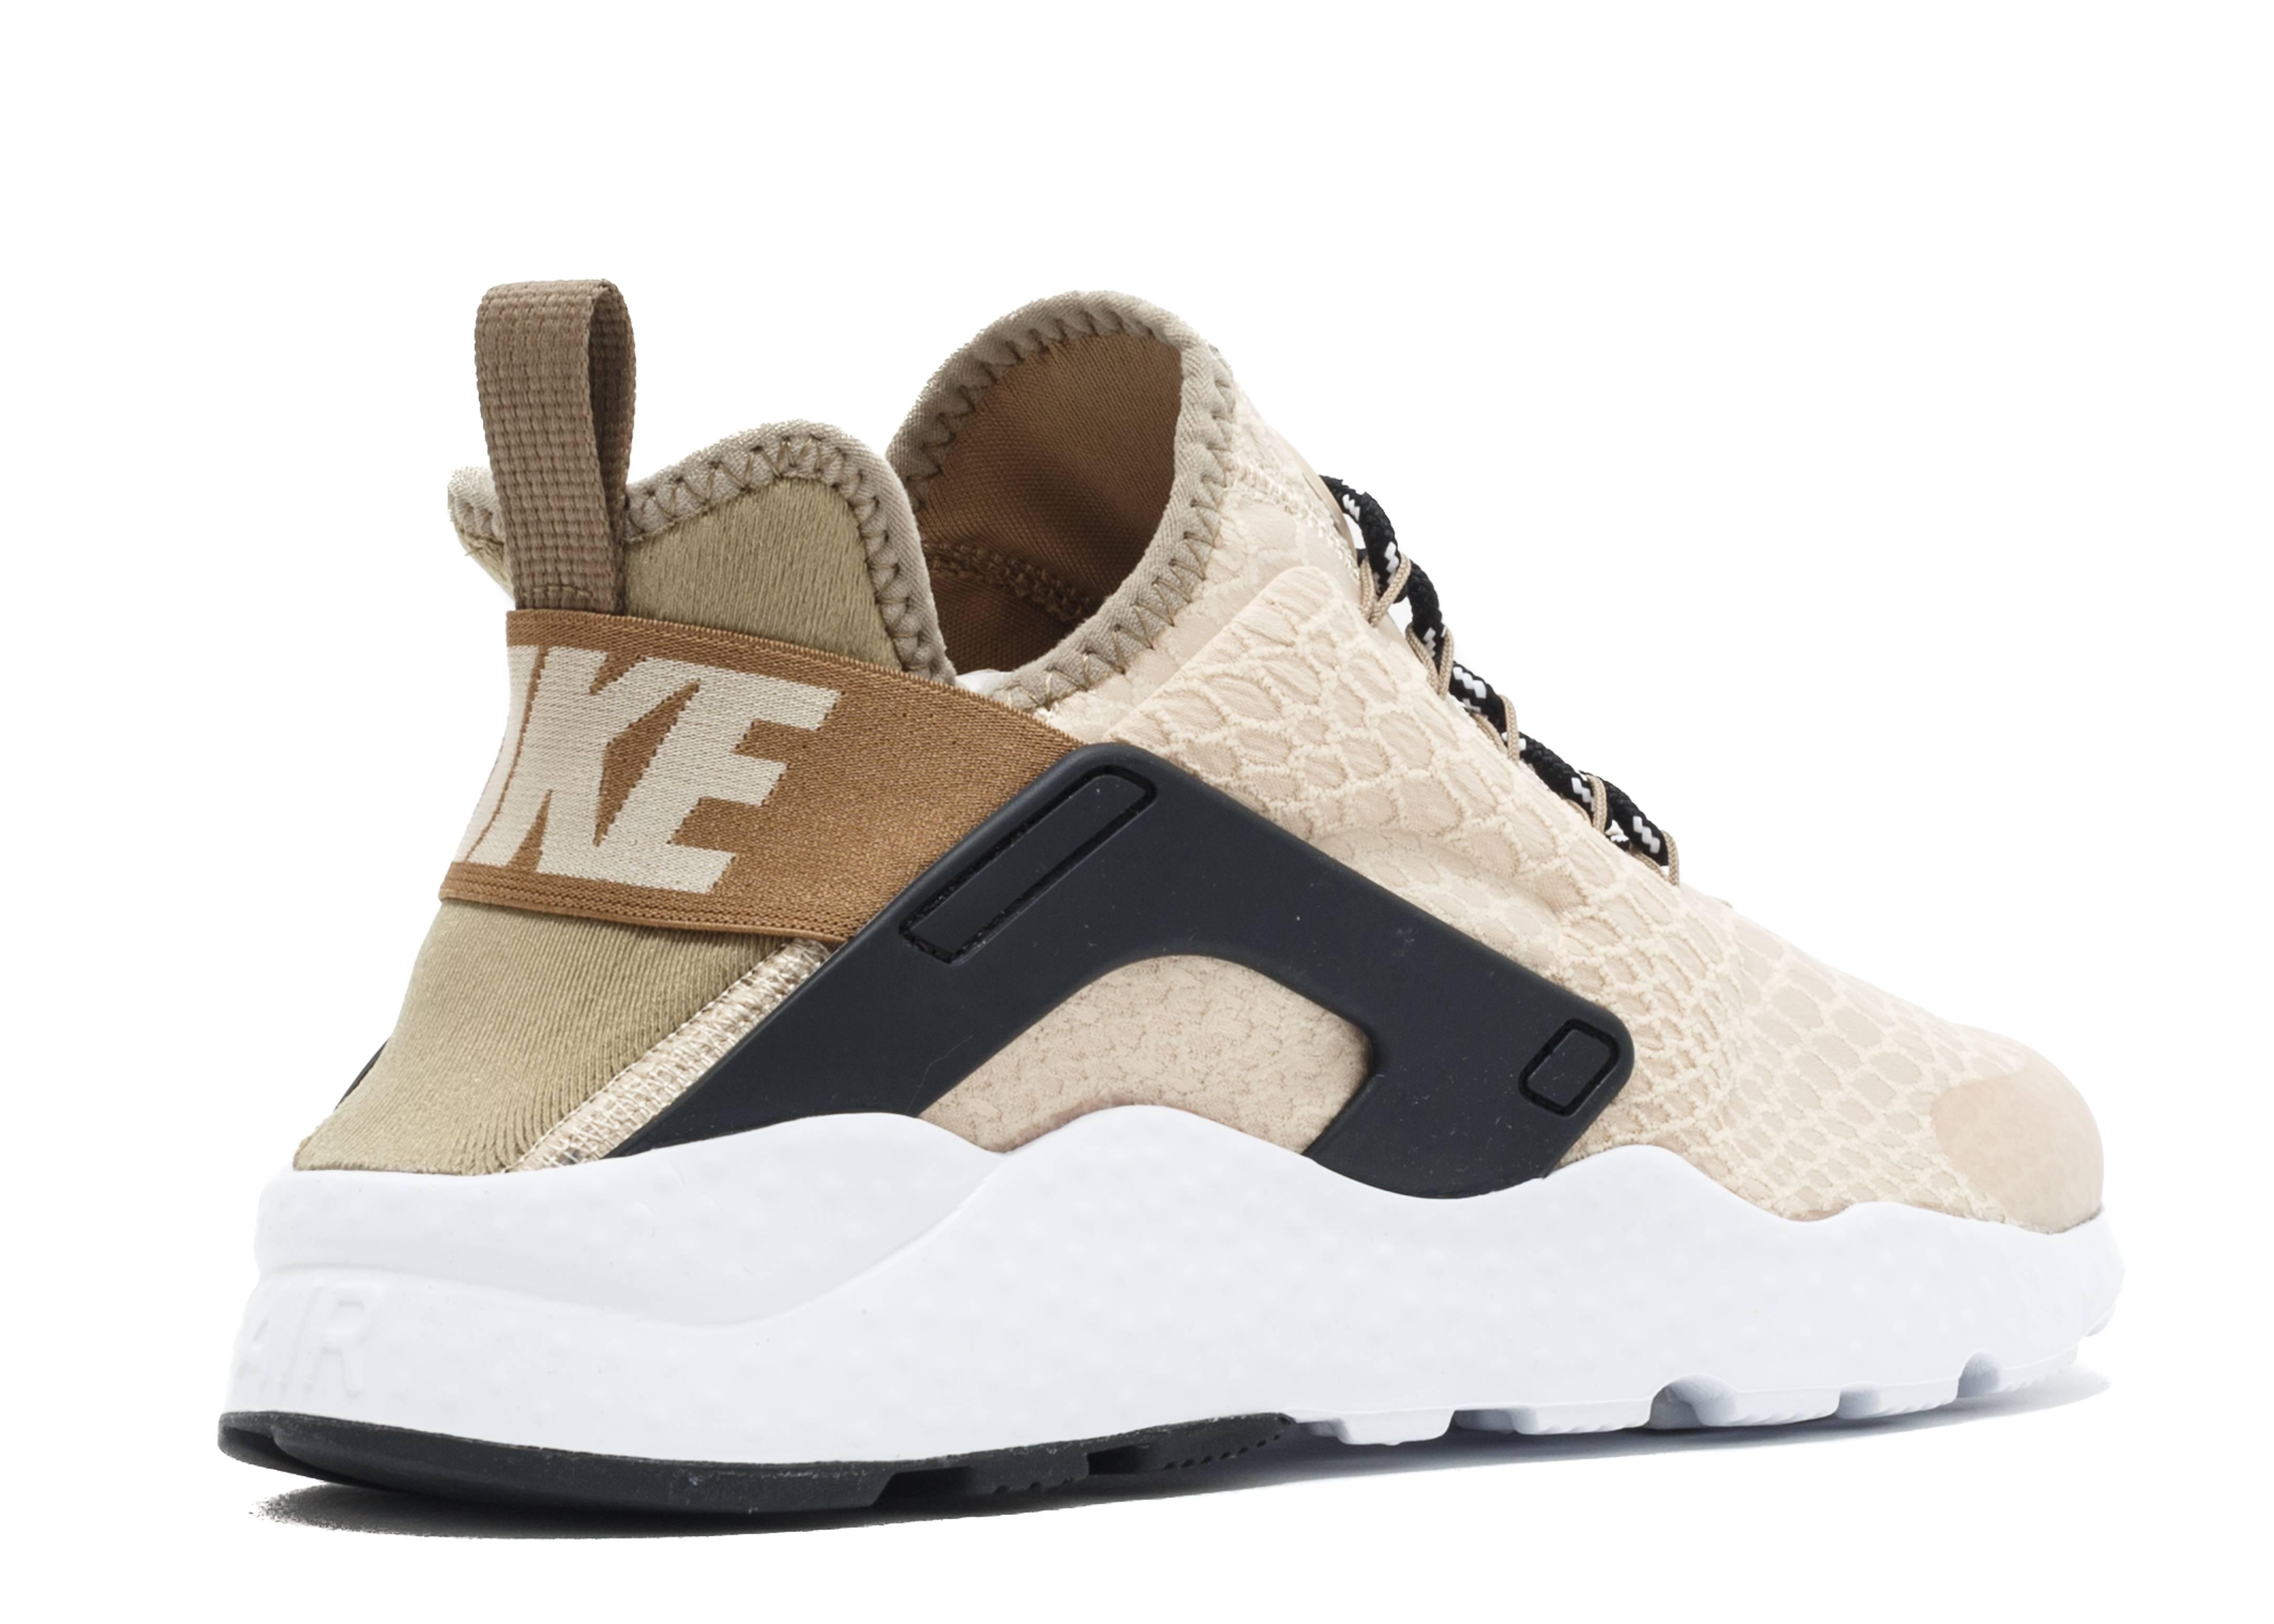 d47e3b02a4f7 W Air Huarache Run Ultra SE - Nike - 859516 100 - oatmeal oatmeal-khaki-black